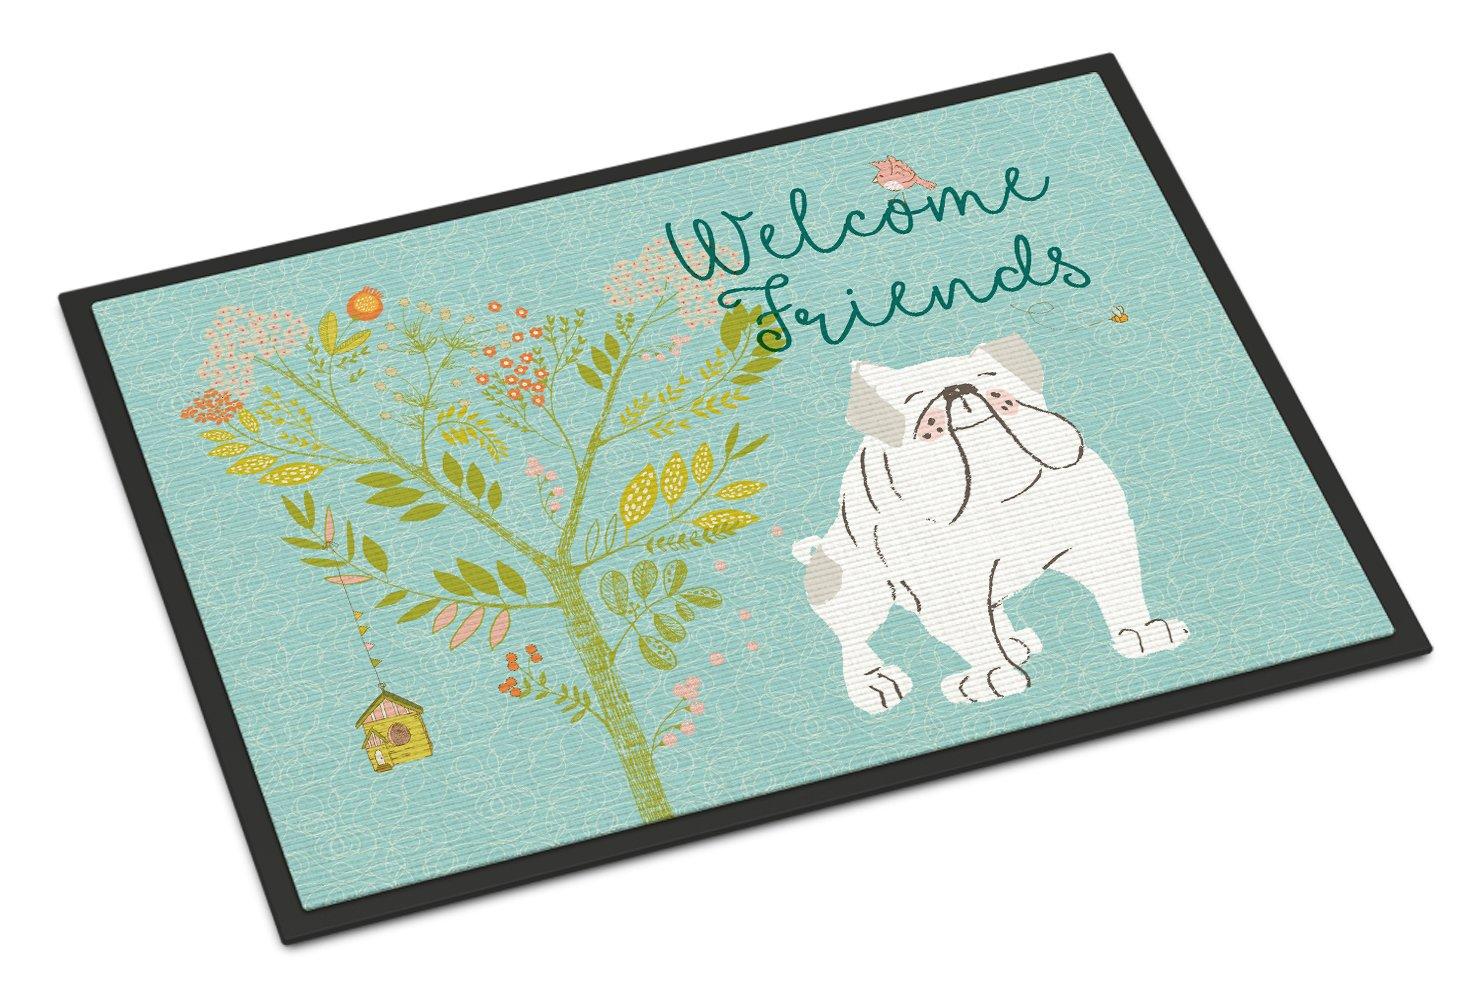 Carolines Treasures Snowman with White English Bulldog Floor Mat 19 x 27 Multicolor